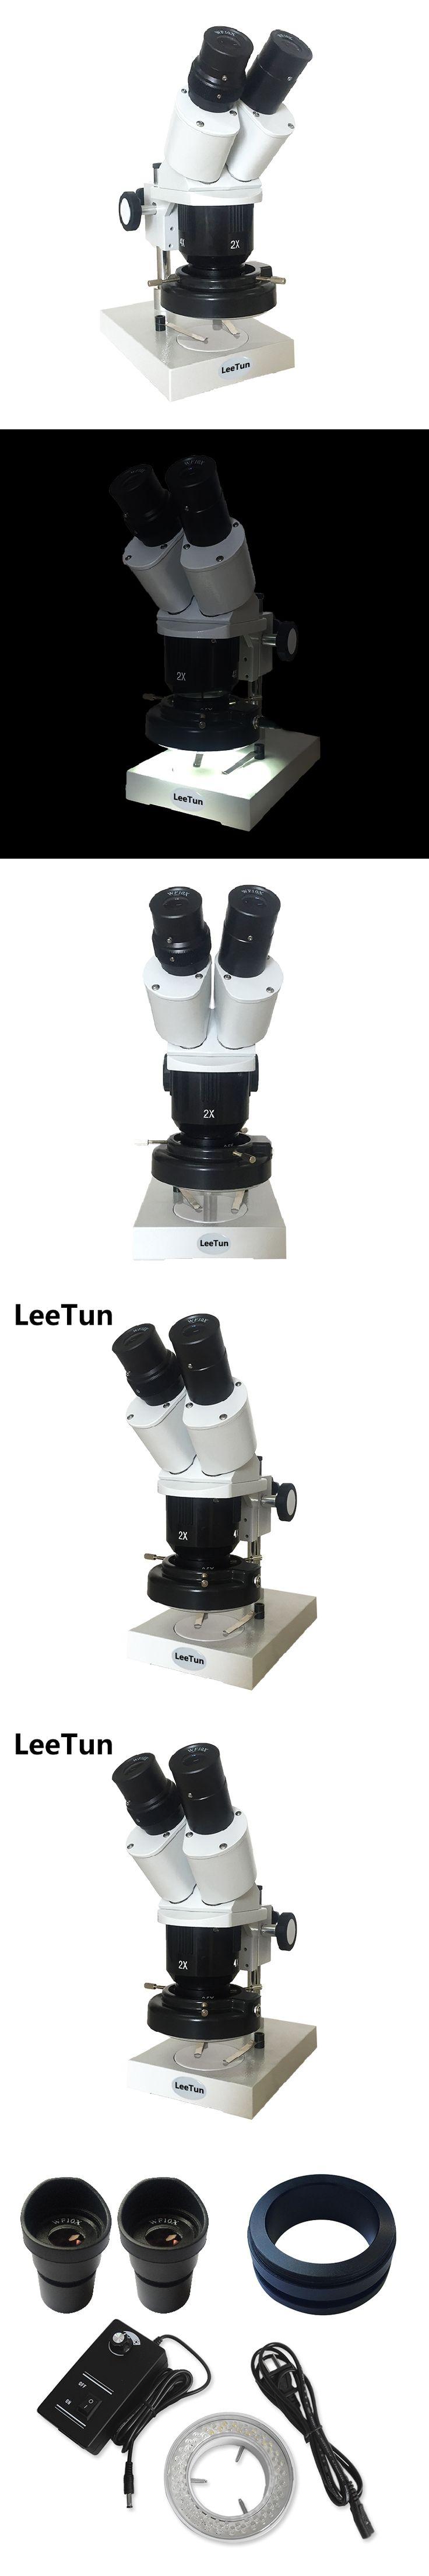 20x-40x Illuminated Binocular Stereo Microscope with External LED Ring Light WF10X Eyepiece 2X 4X Objective